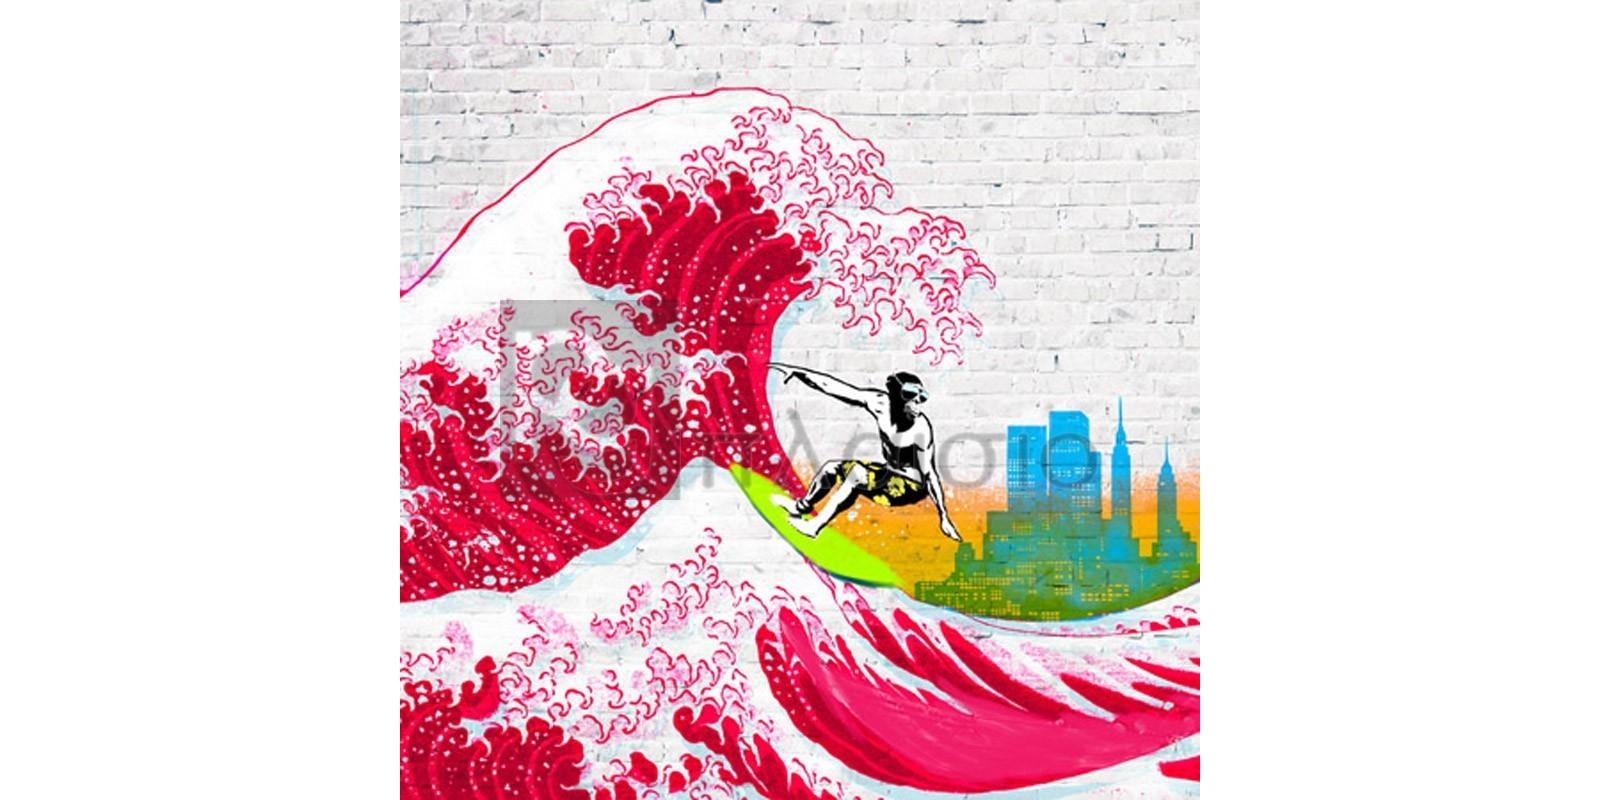 Masterfunk Collective - Surfin' NYC (detail)